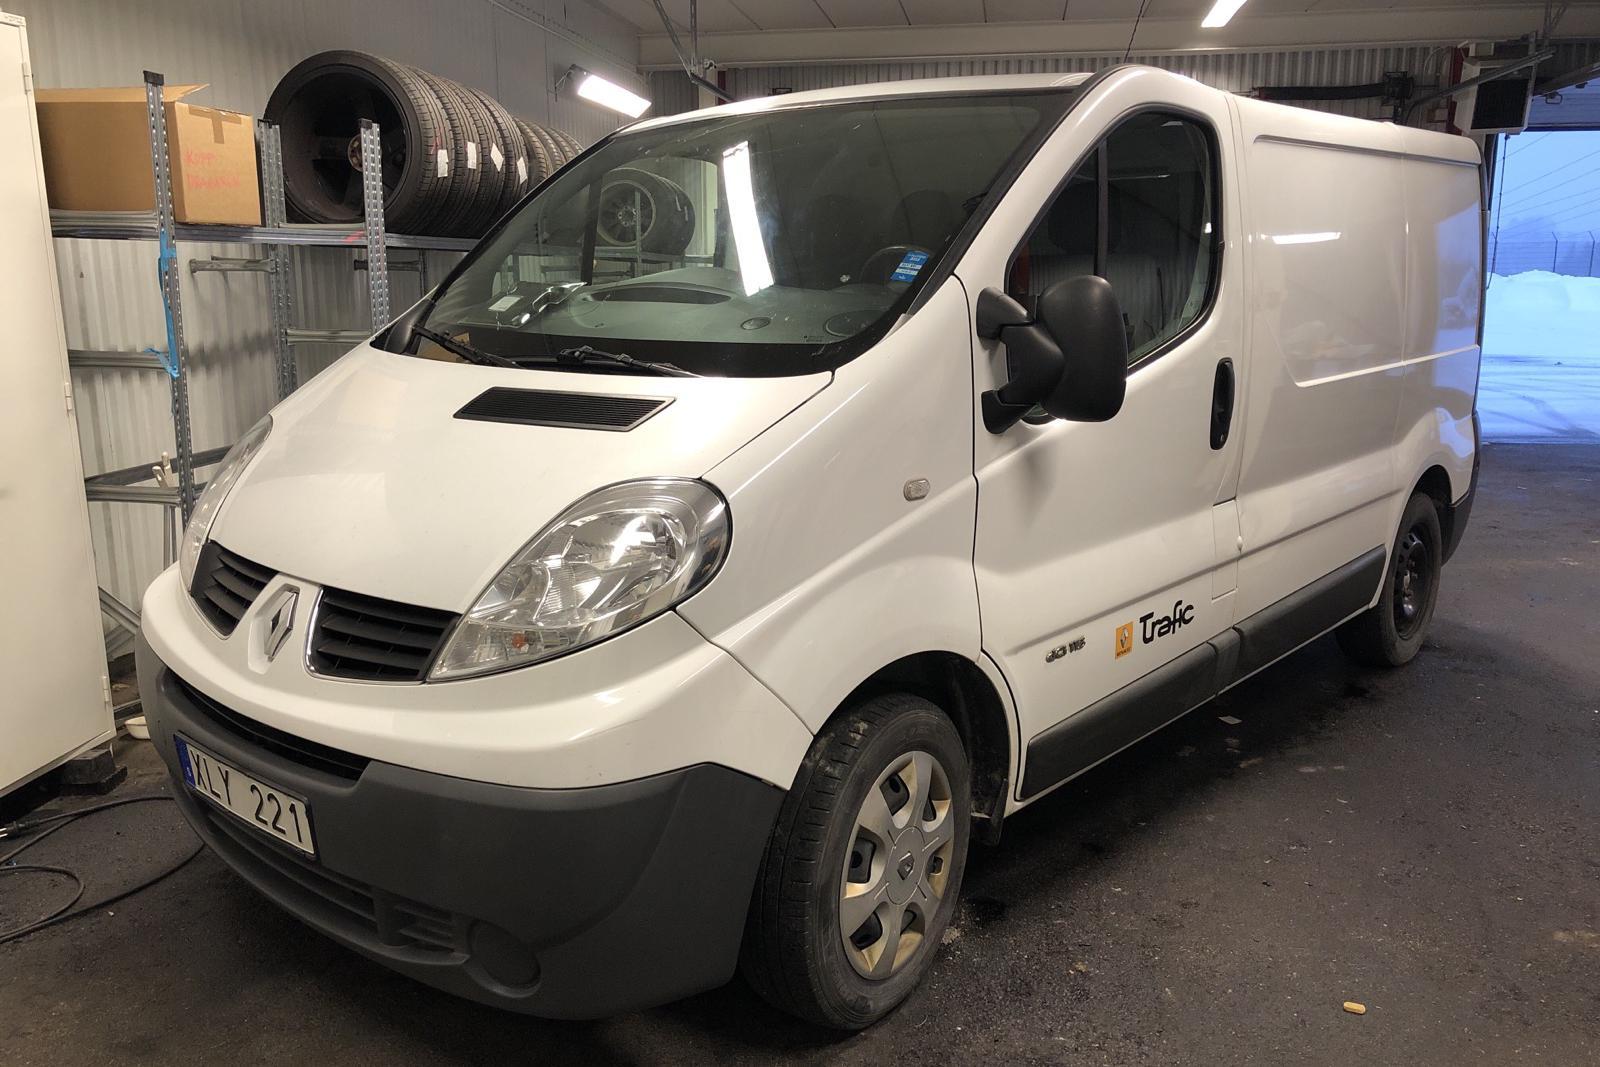 Renault Trafic 2.0 dCi Skåp/Buss (115hk) - 15 362 mil - Manuell - vit - 2014